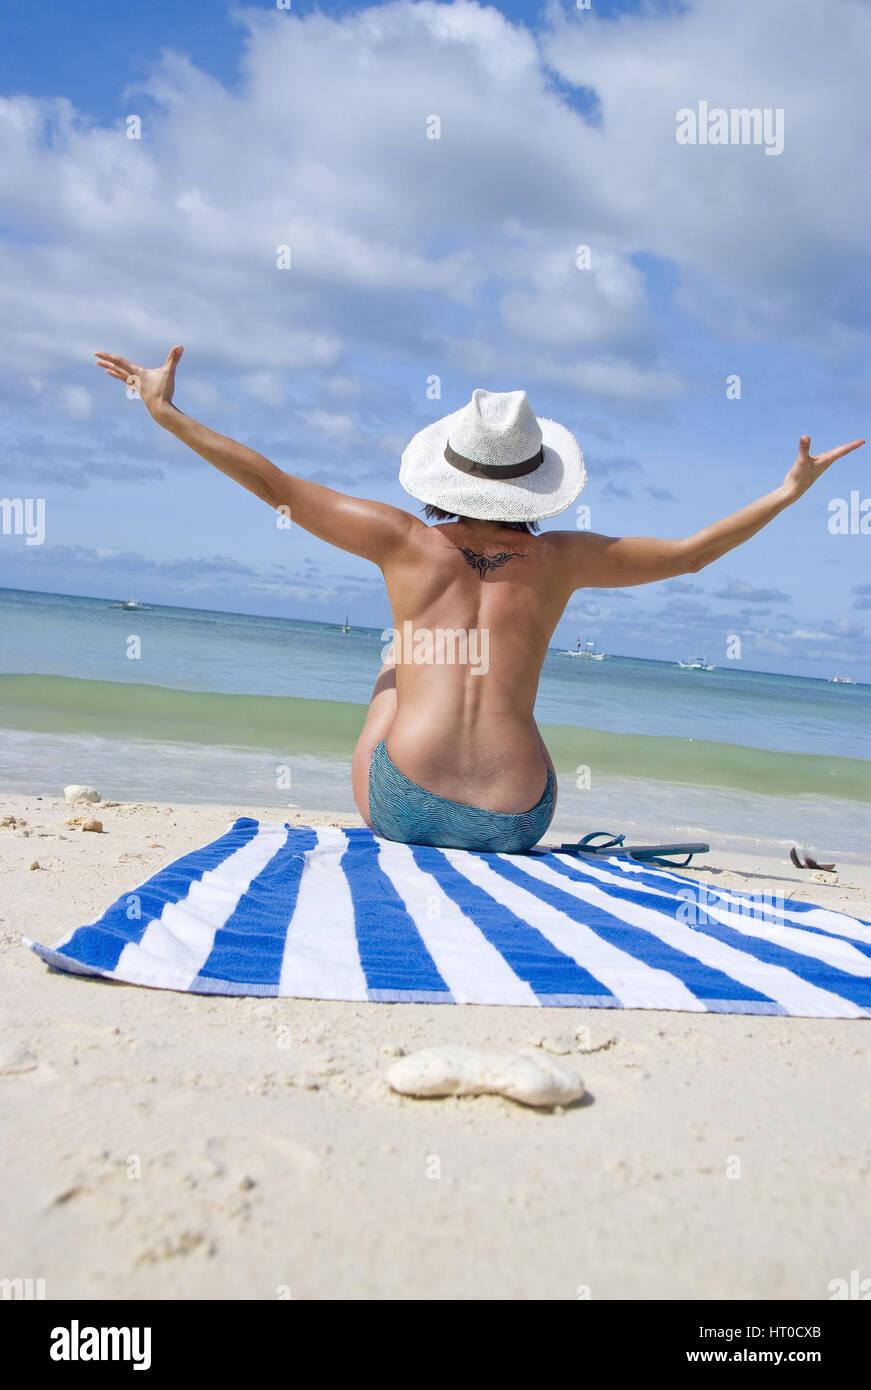 Junge Frau genie?t Strandurlaub - woman enjoying on the beach - Stock Image